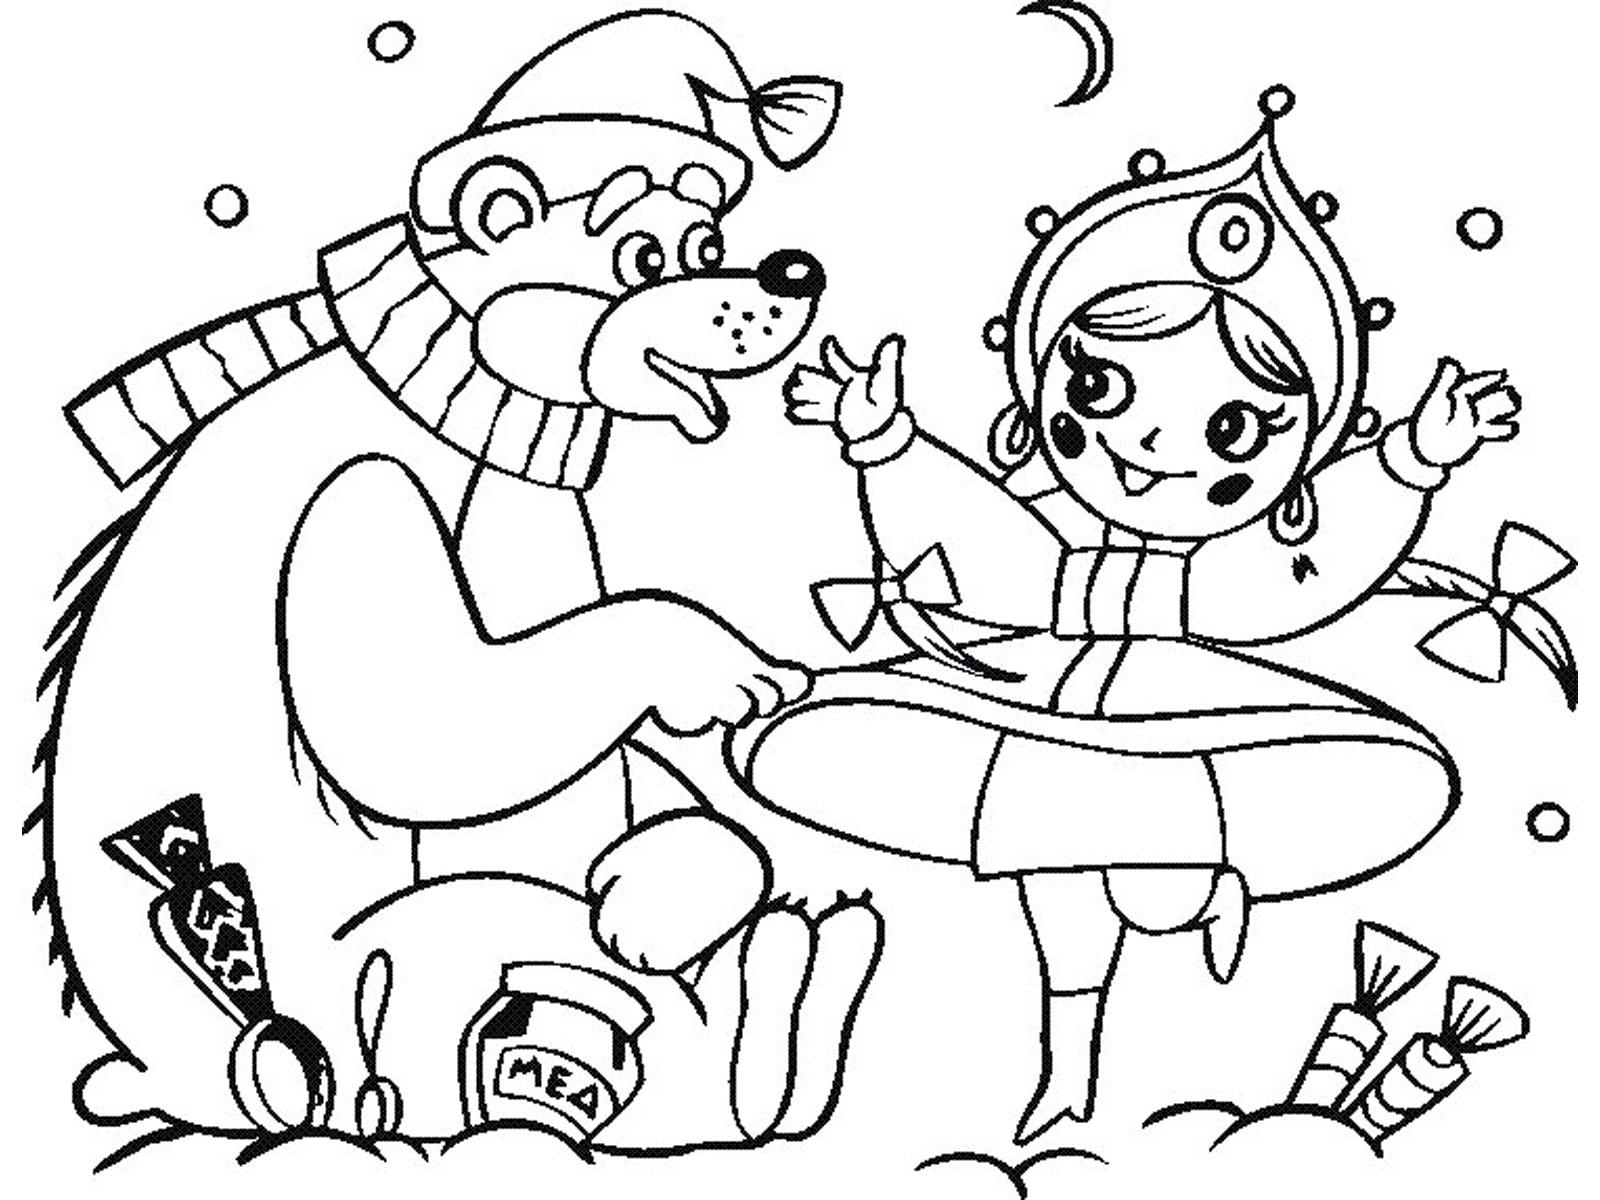 Раскраски онлайн новогодняя